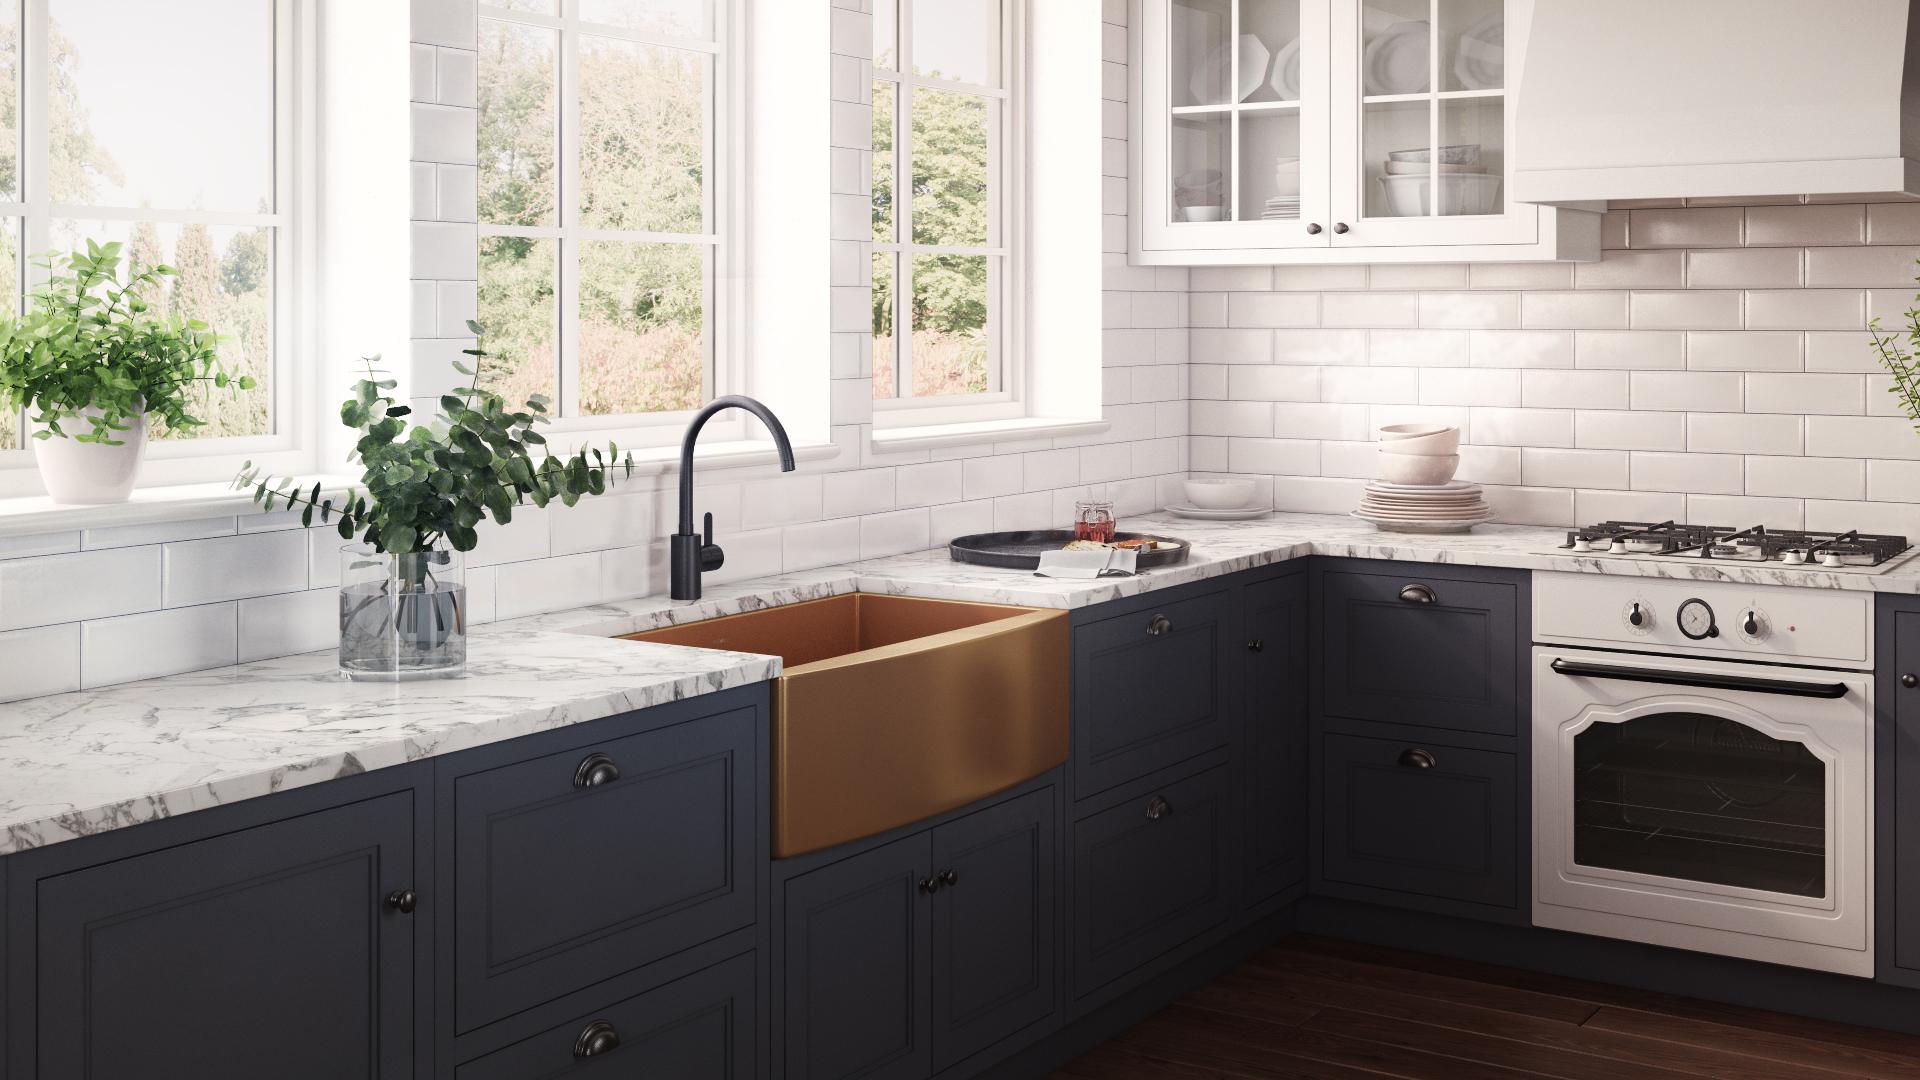 33 Inch Apron Front Farmhouse Kitchen Sink Copper Tone Matte Bronze Stainless Steel Single Bowl Ruvati Usa